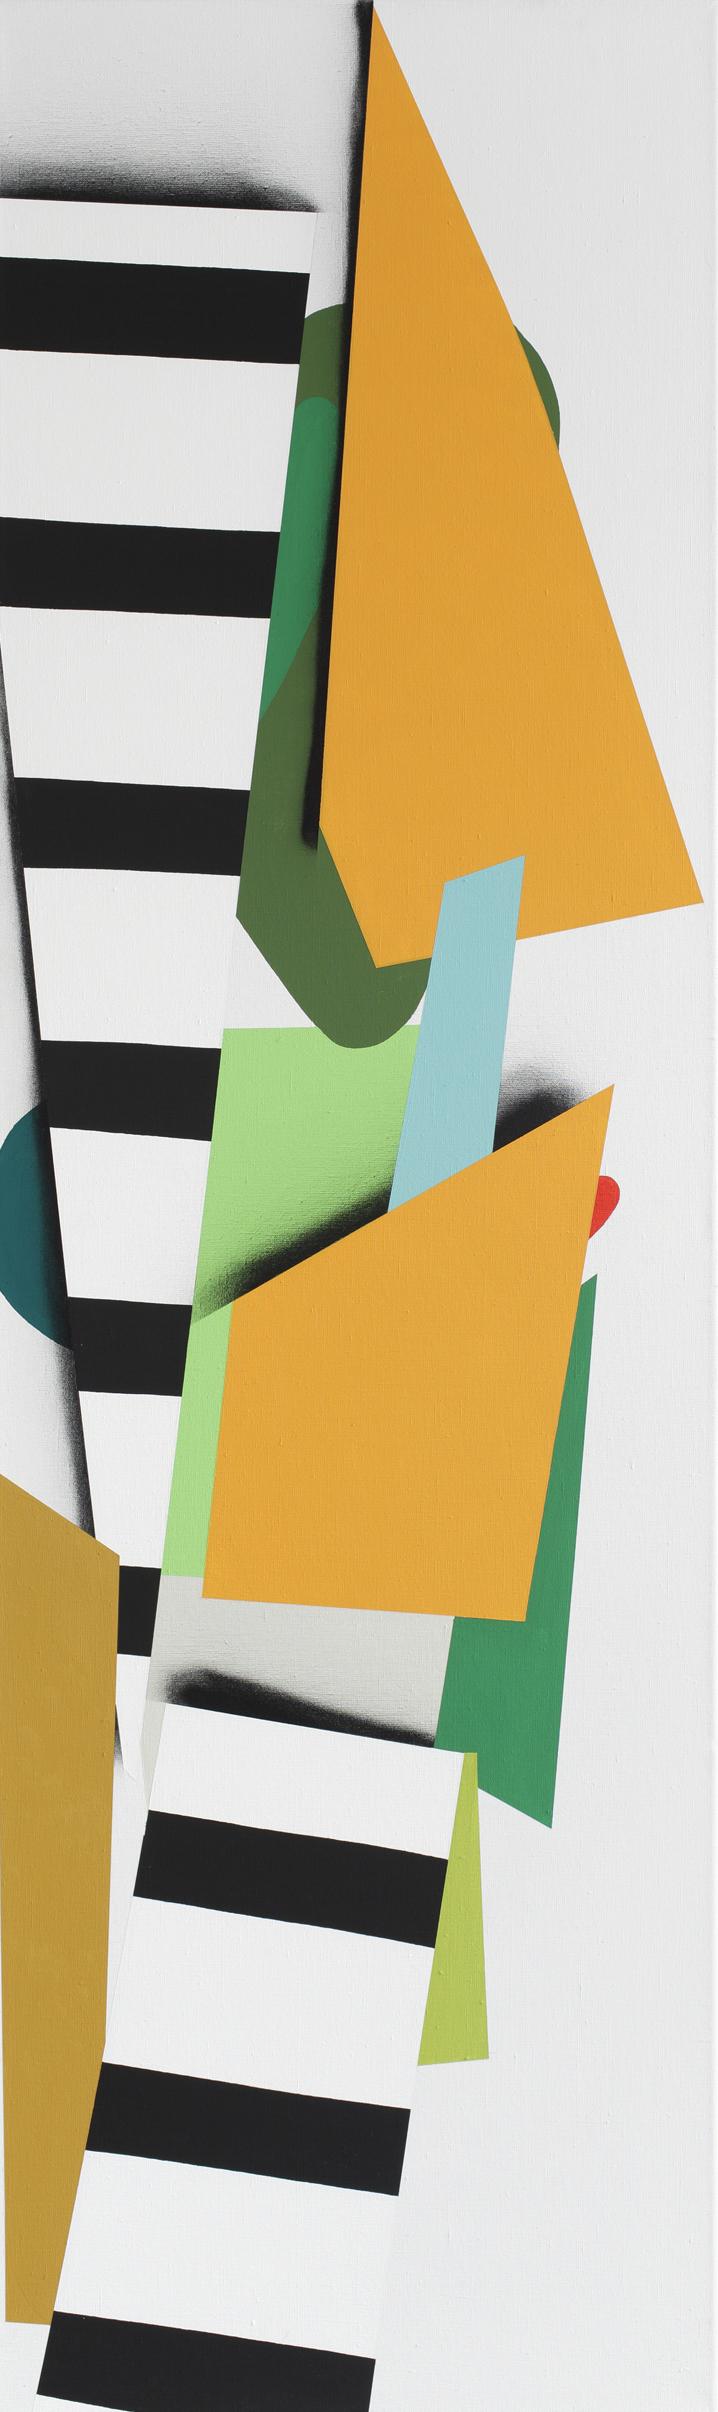 Plastika c. 1, 2012, akryl na platne, 200 x 60 cm.jpg